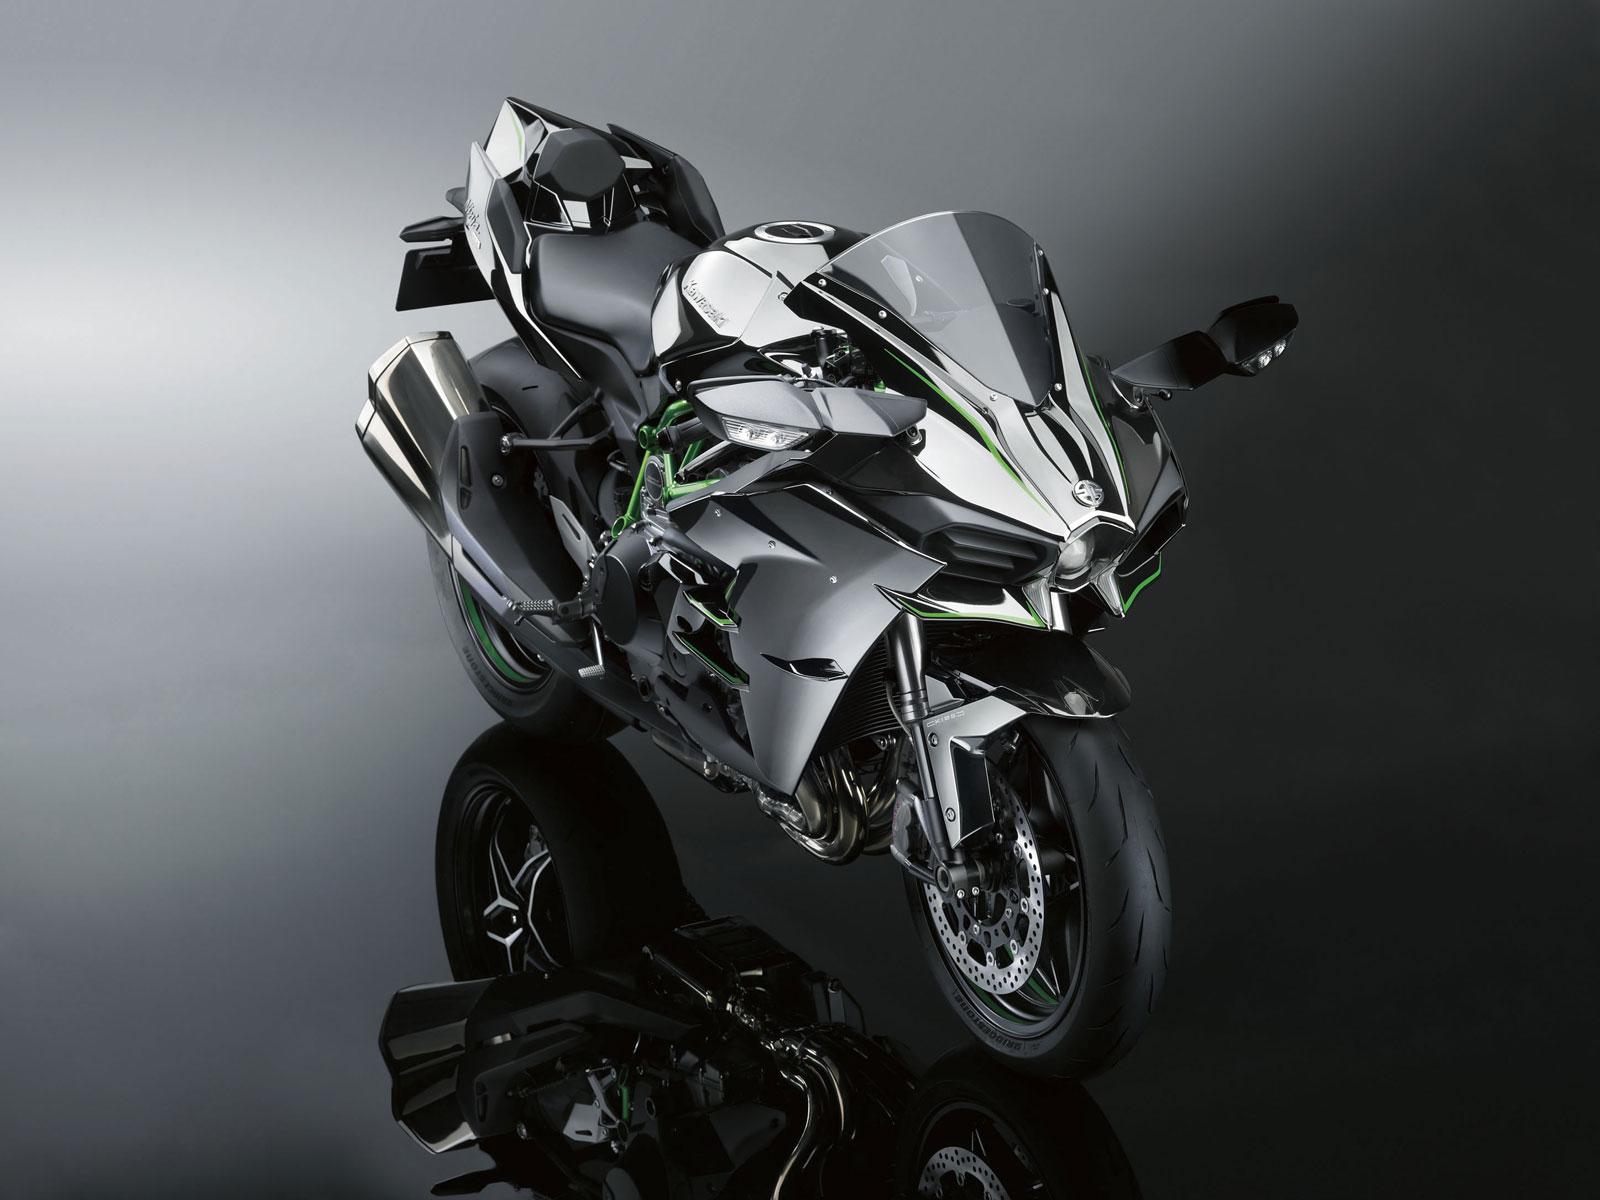 Kawasaki Ninja H2 And H2r Prices Revelaled Autopromag